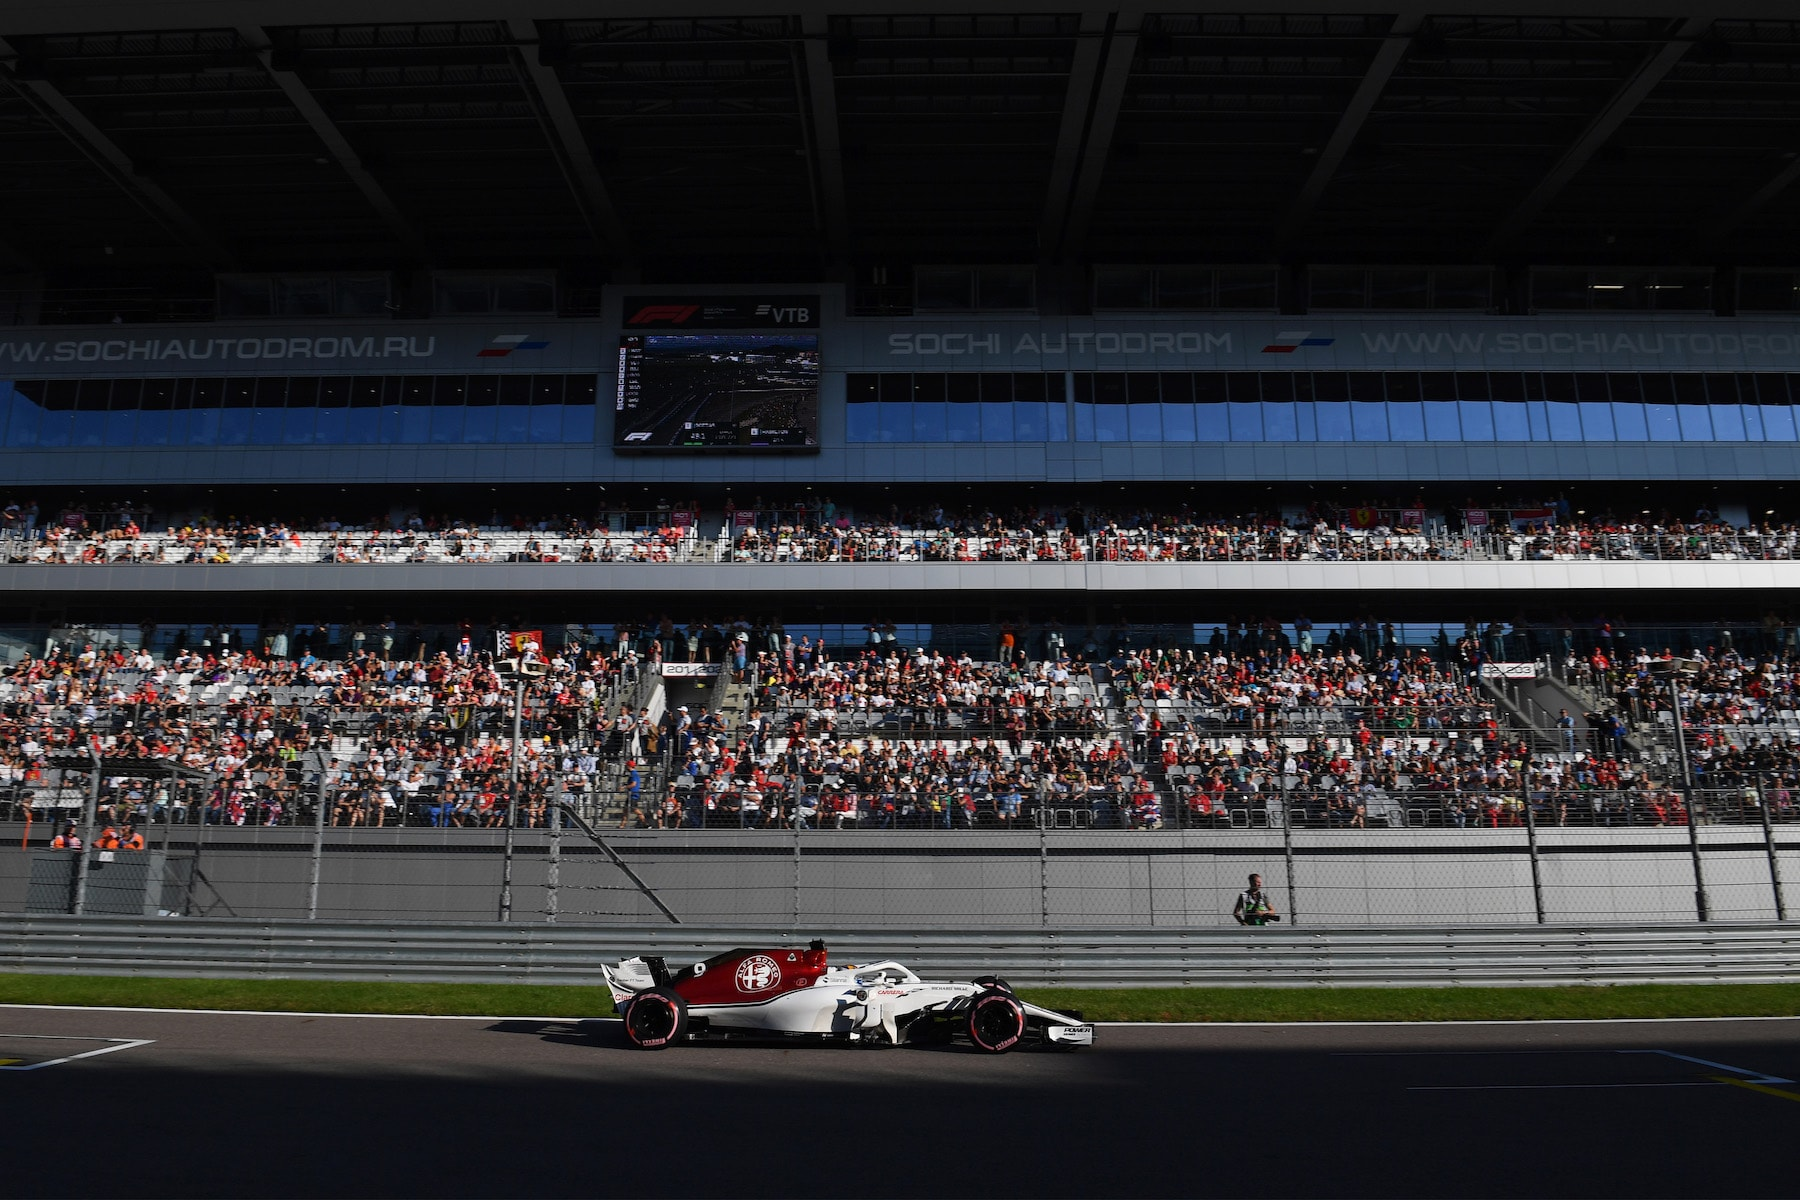 J 2018 Marcus Ericsson | Sauber C37 | 2018 Russian GP 3 copy.jpg